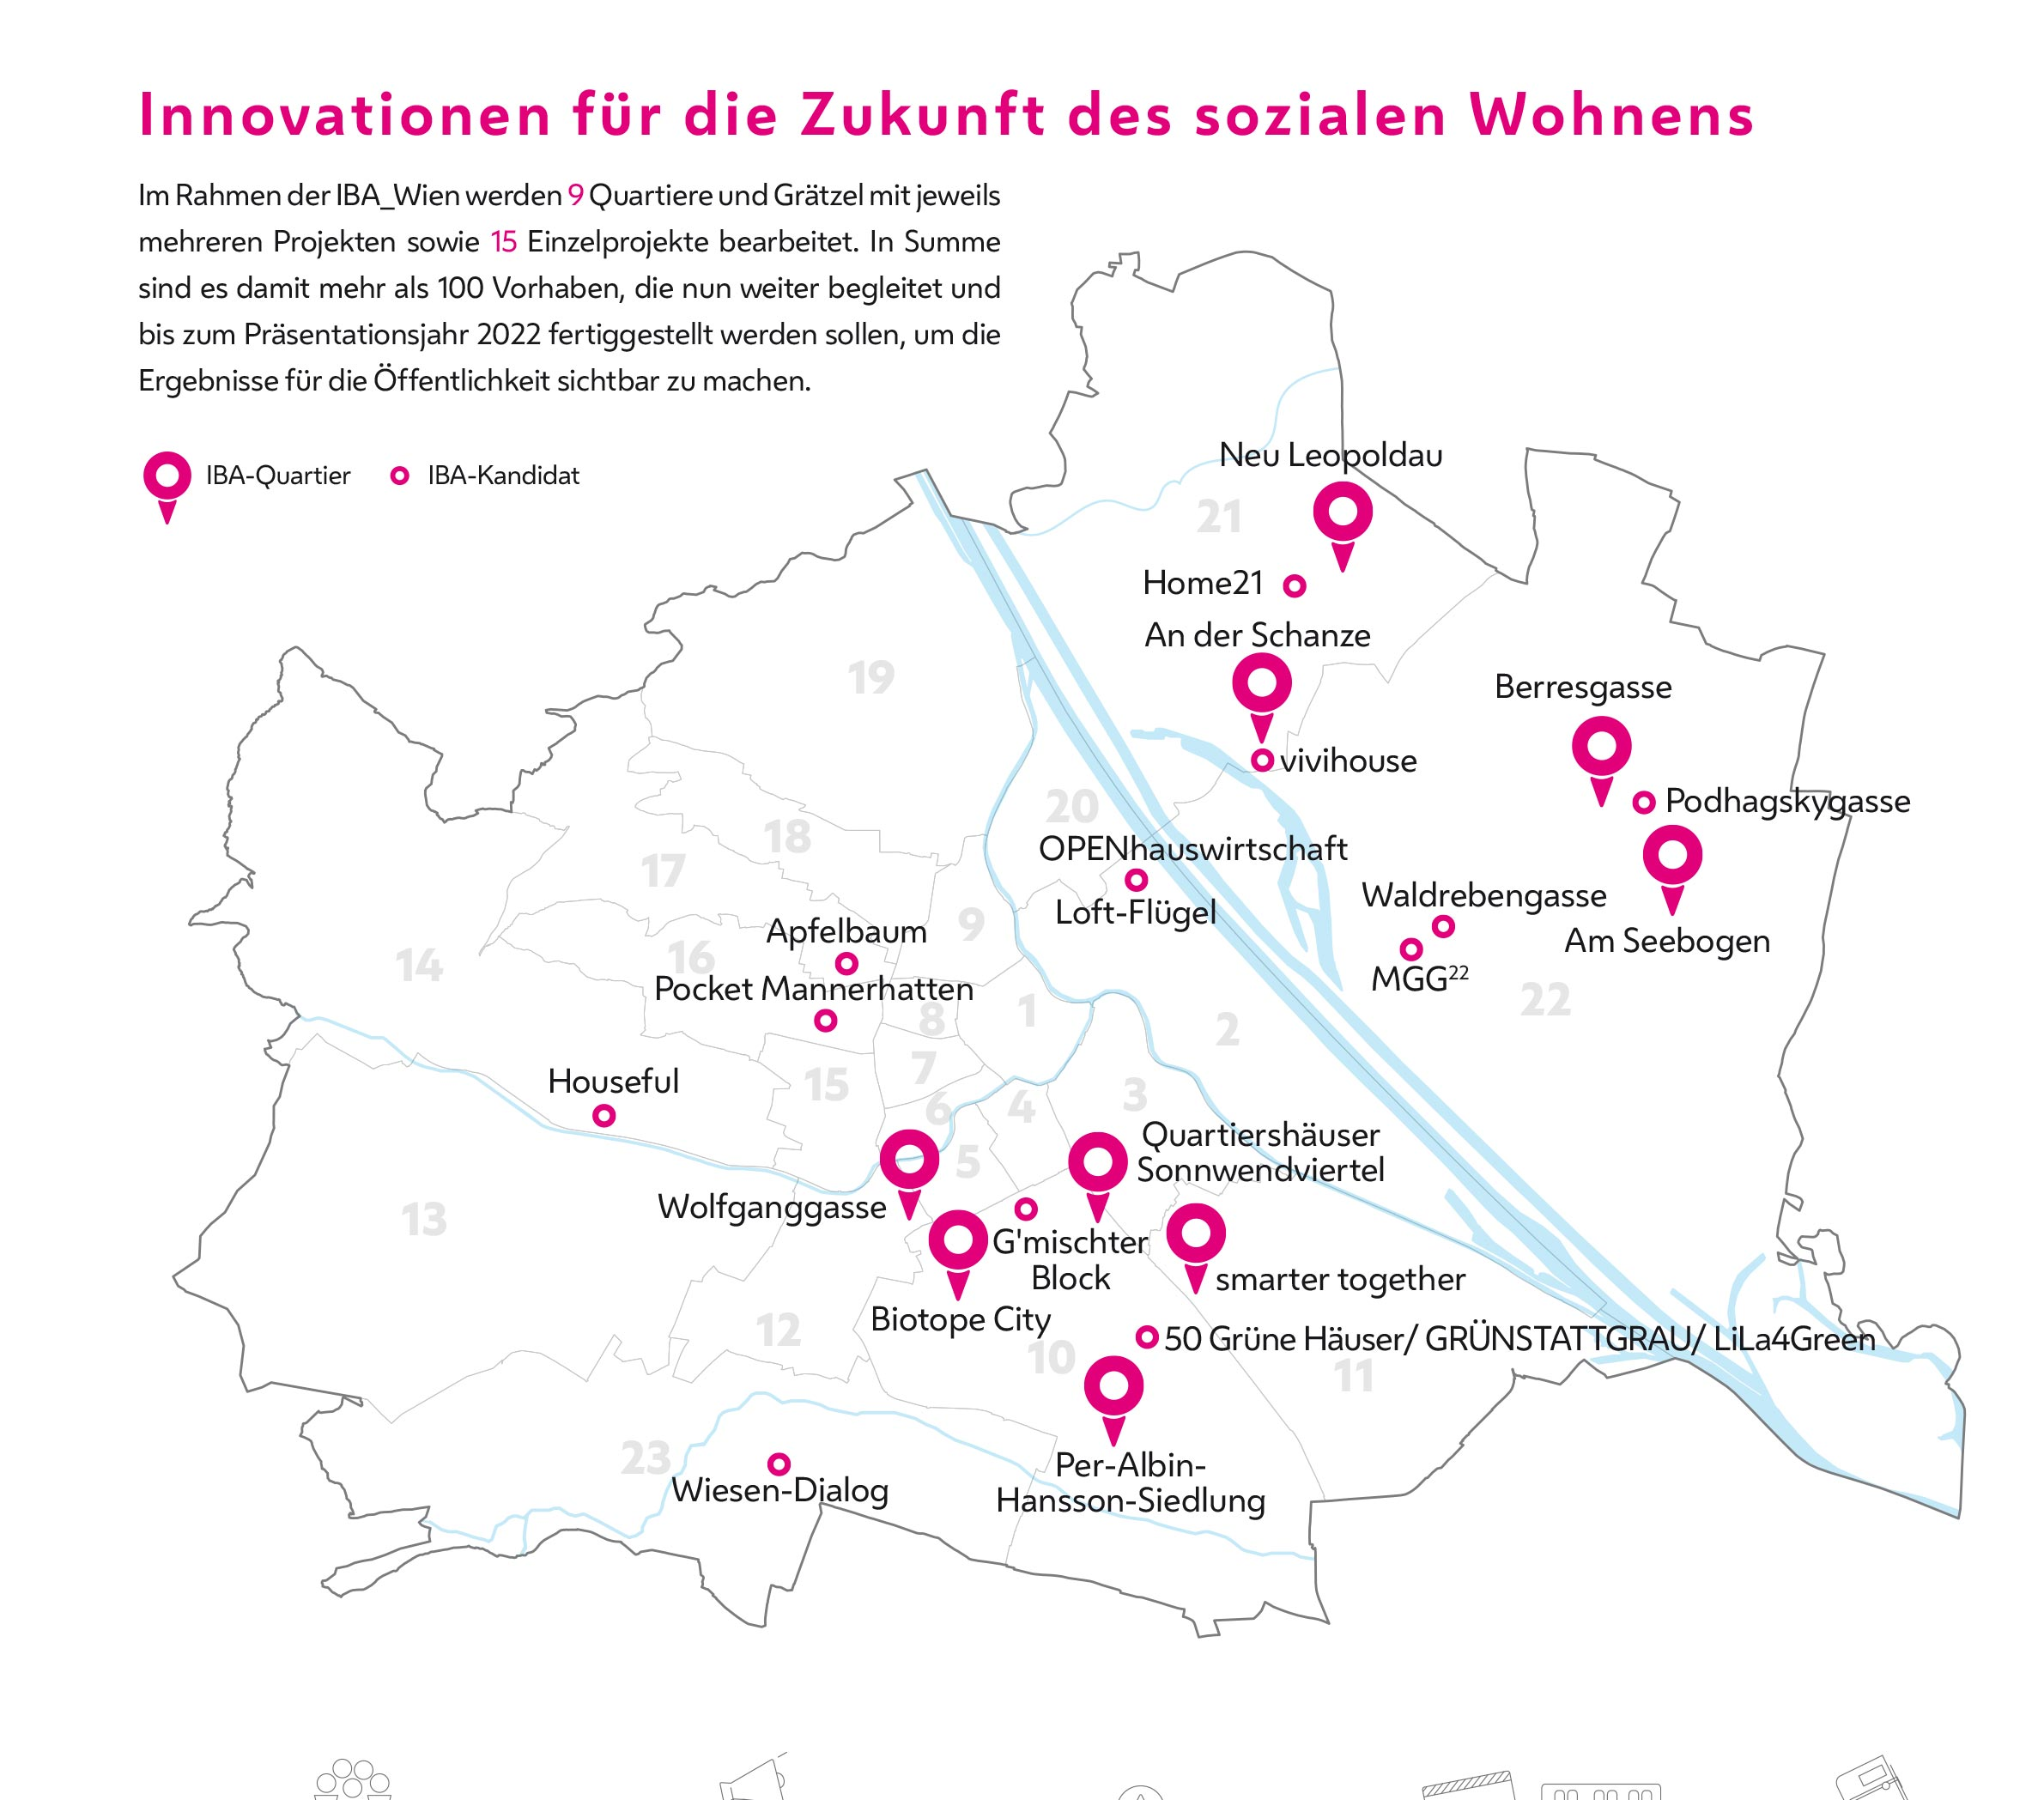 Internat. Bauausstellung (IBA) Wien 2022